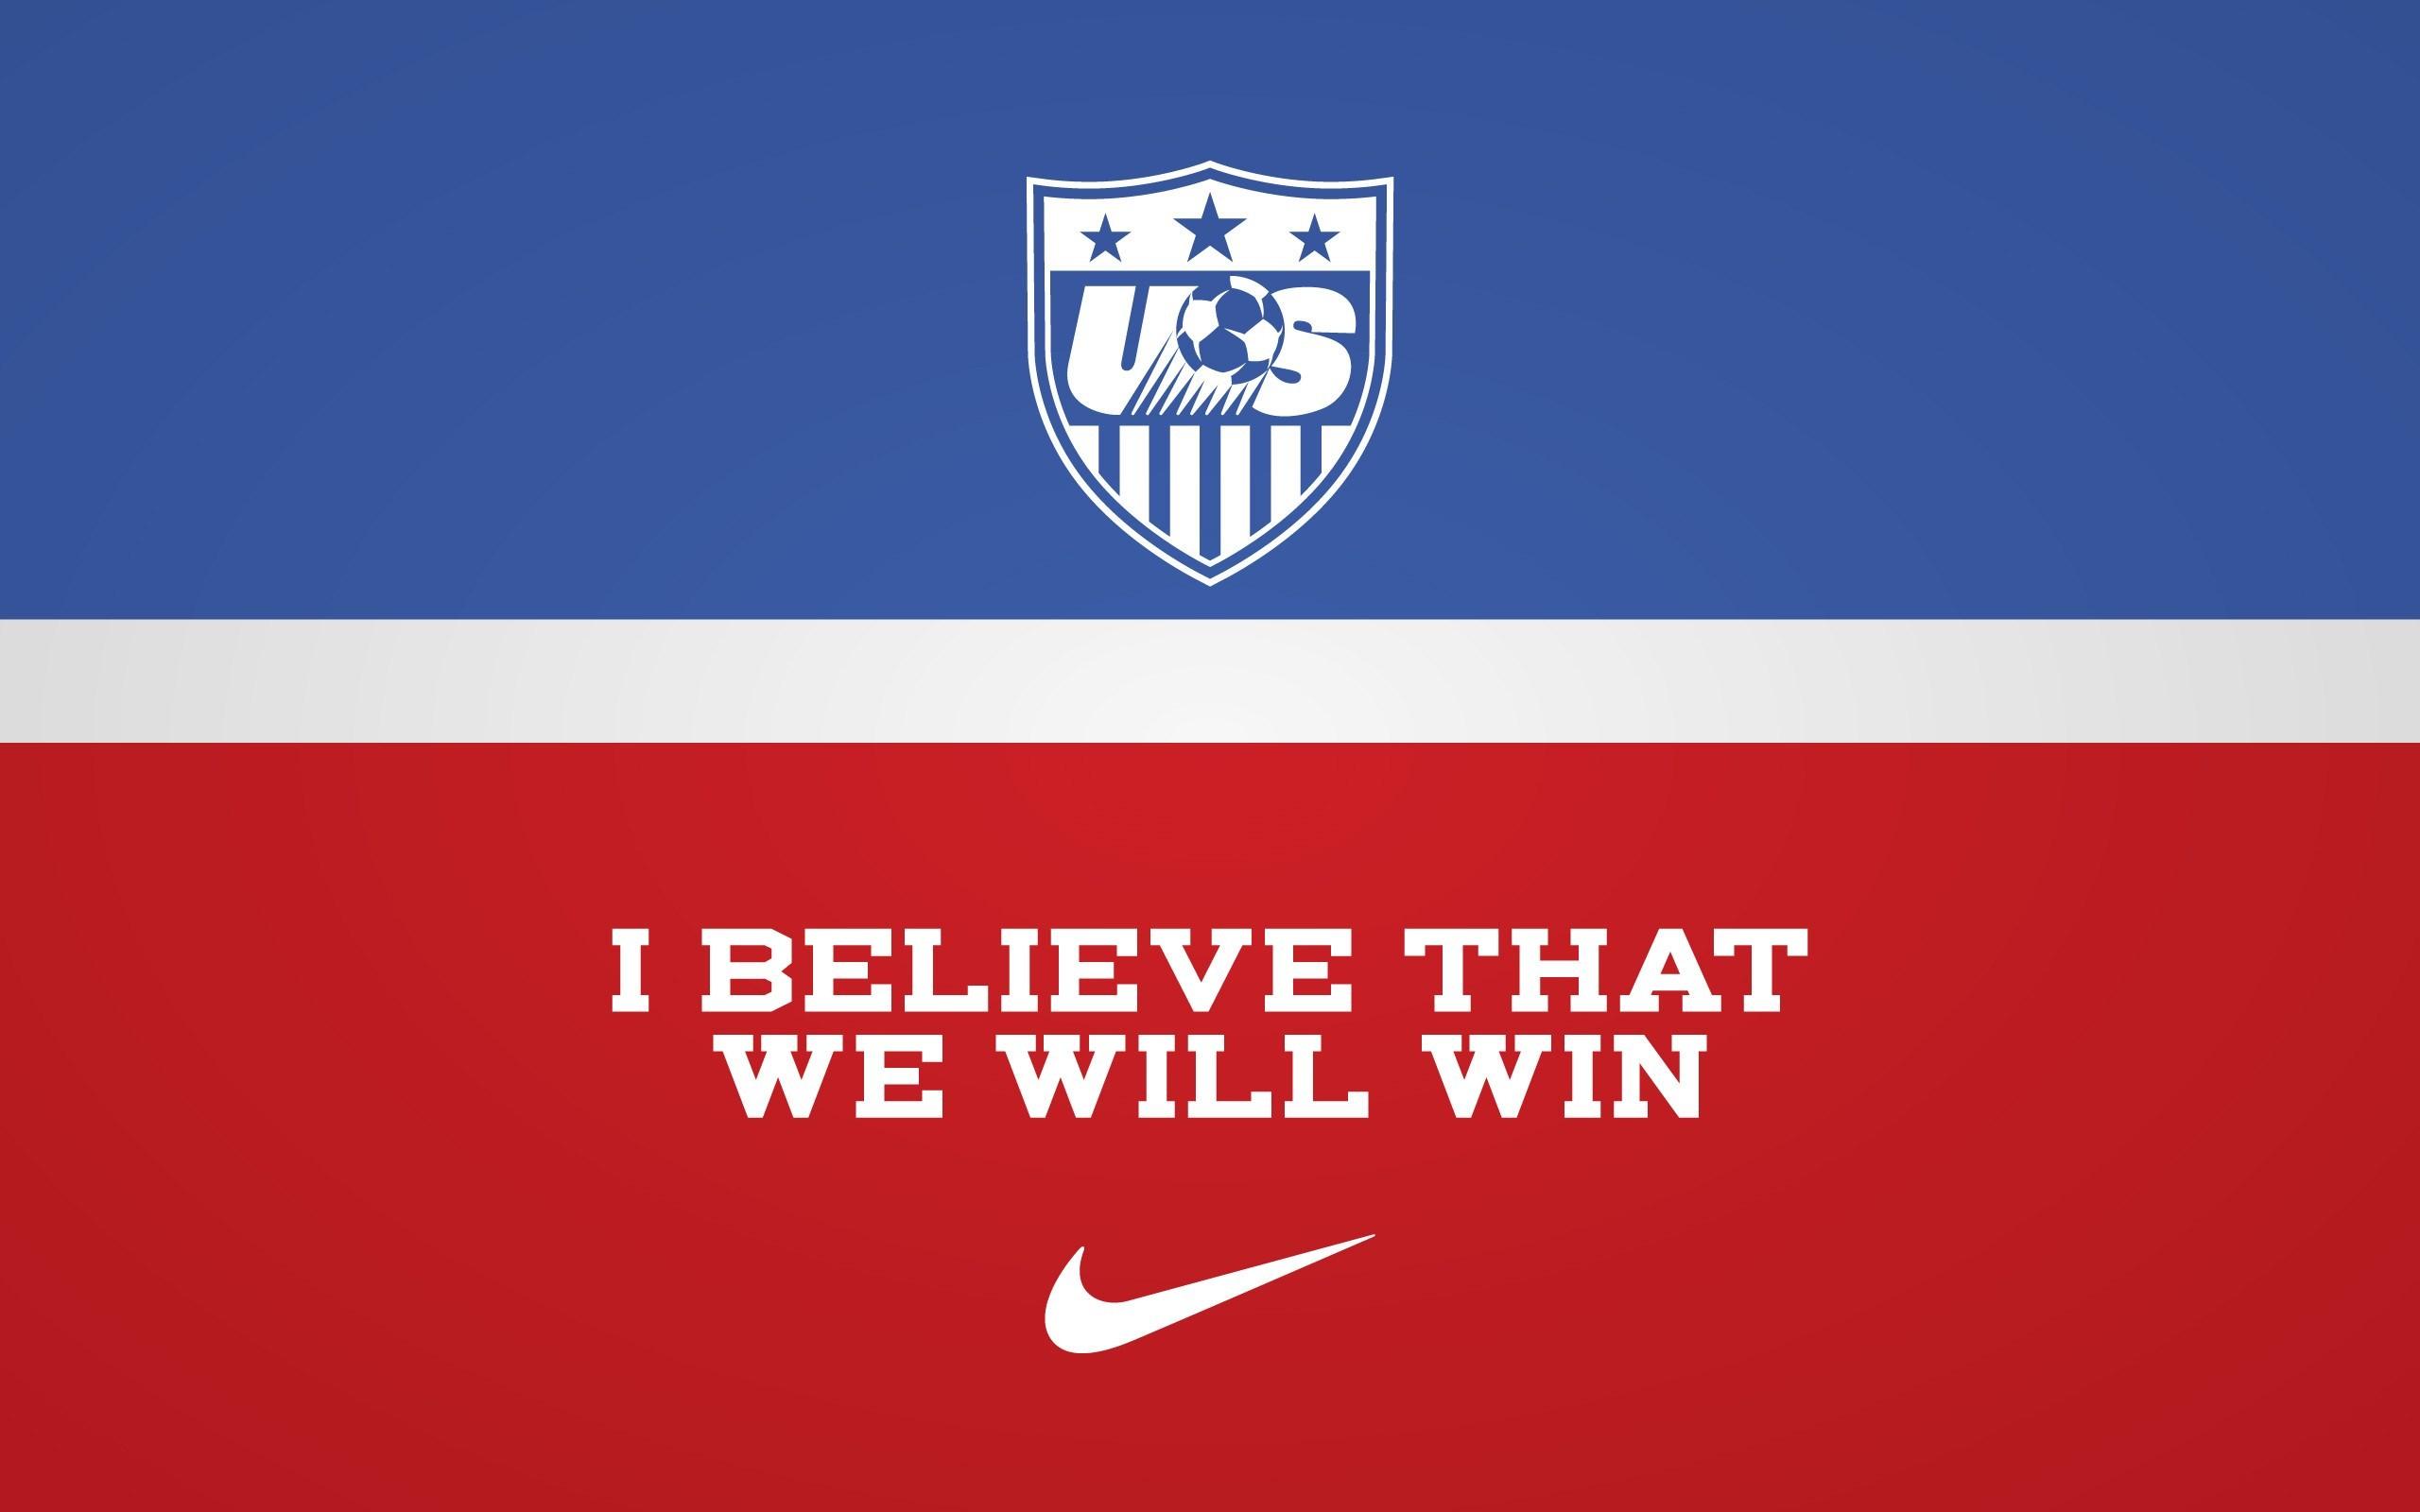 us women's soccer wallpaper …